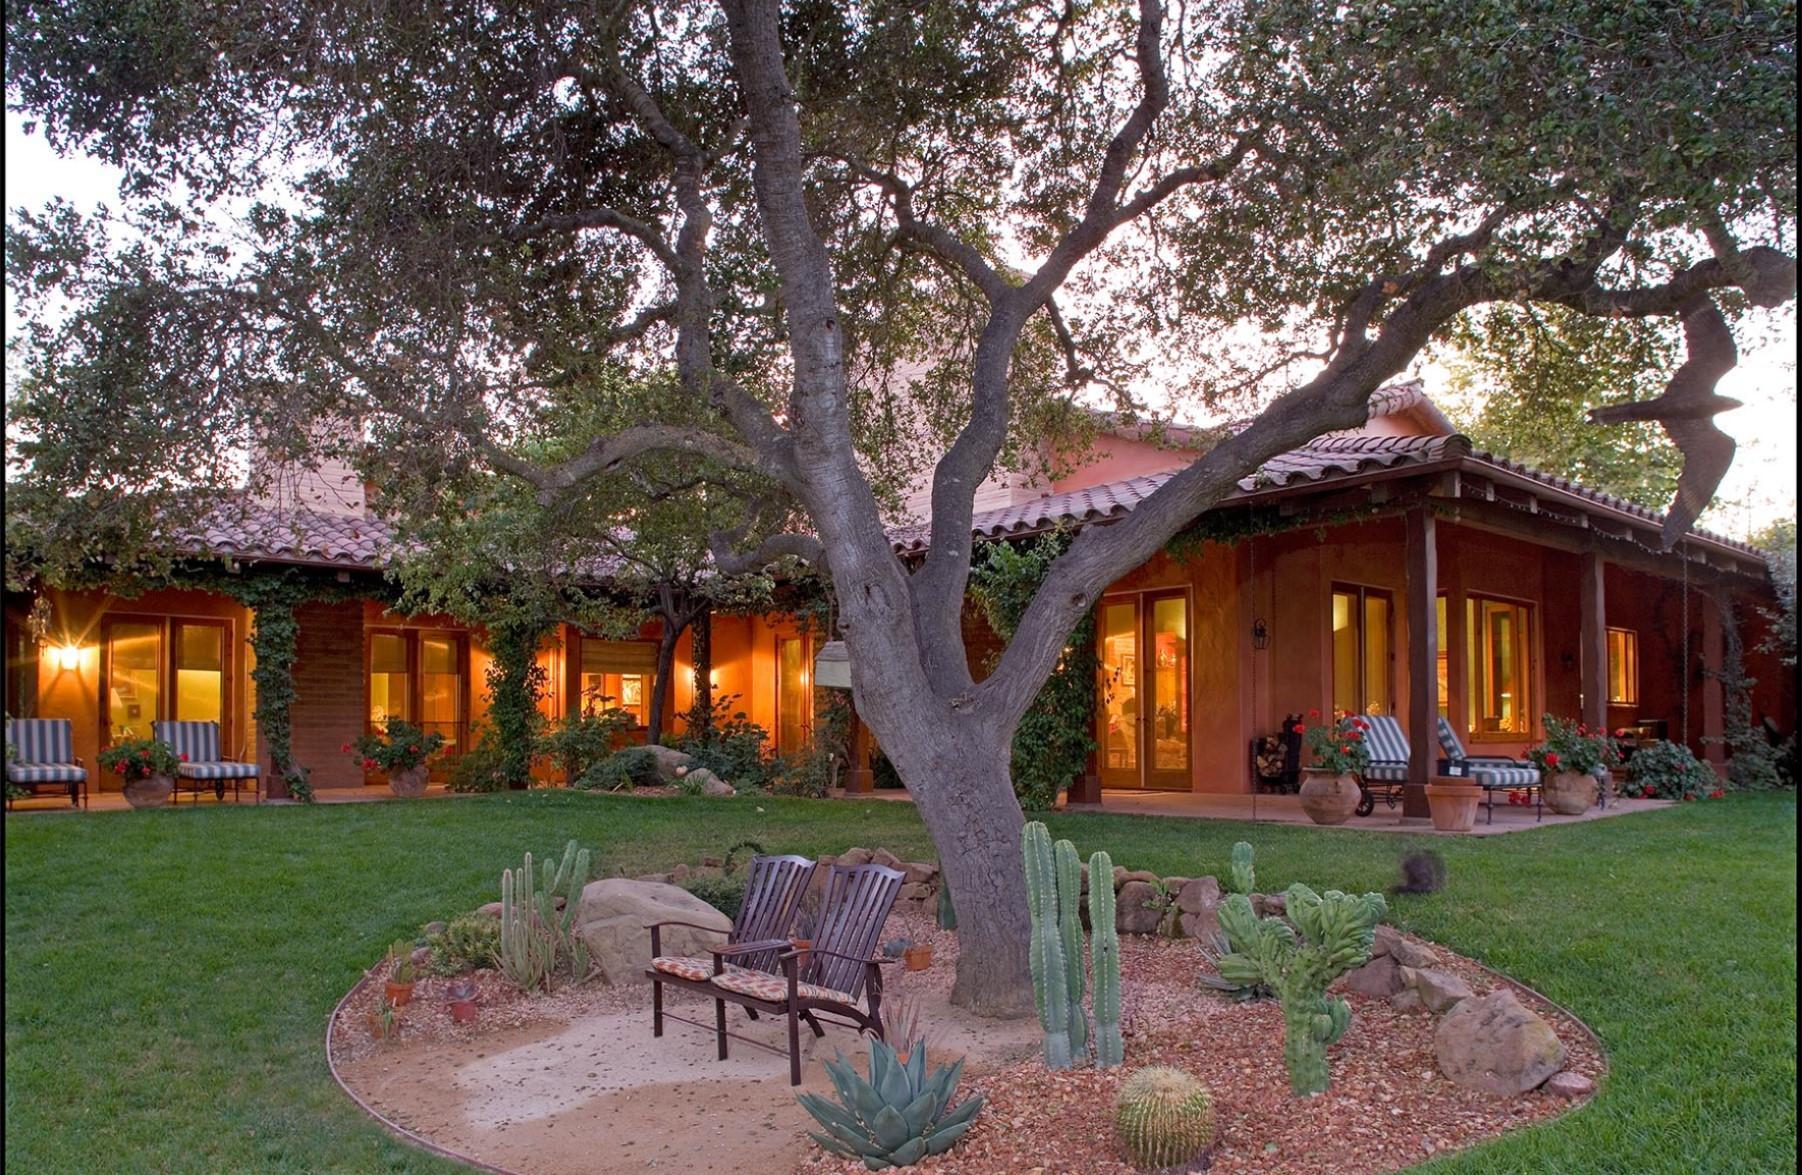 Property photo for 2985 Brinkerhoff Ave Santa Ynez, California 93460 - 18-46